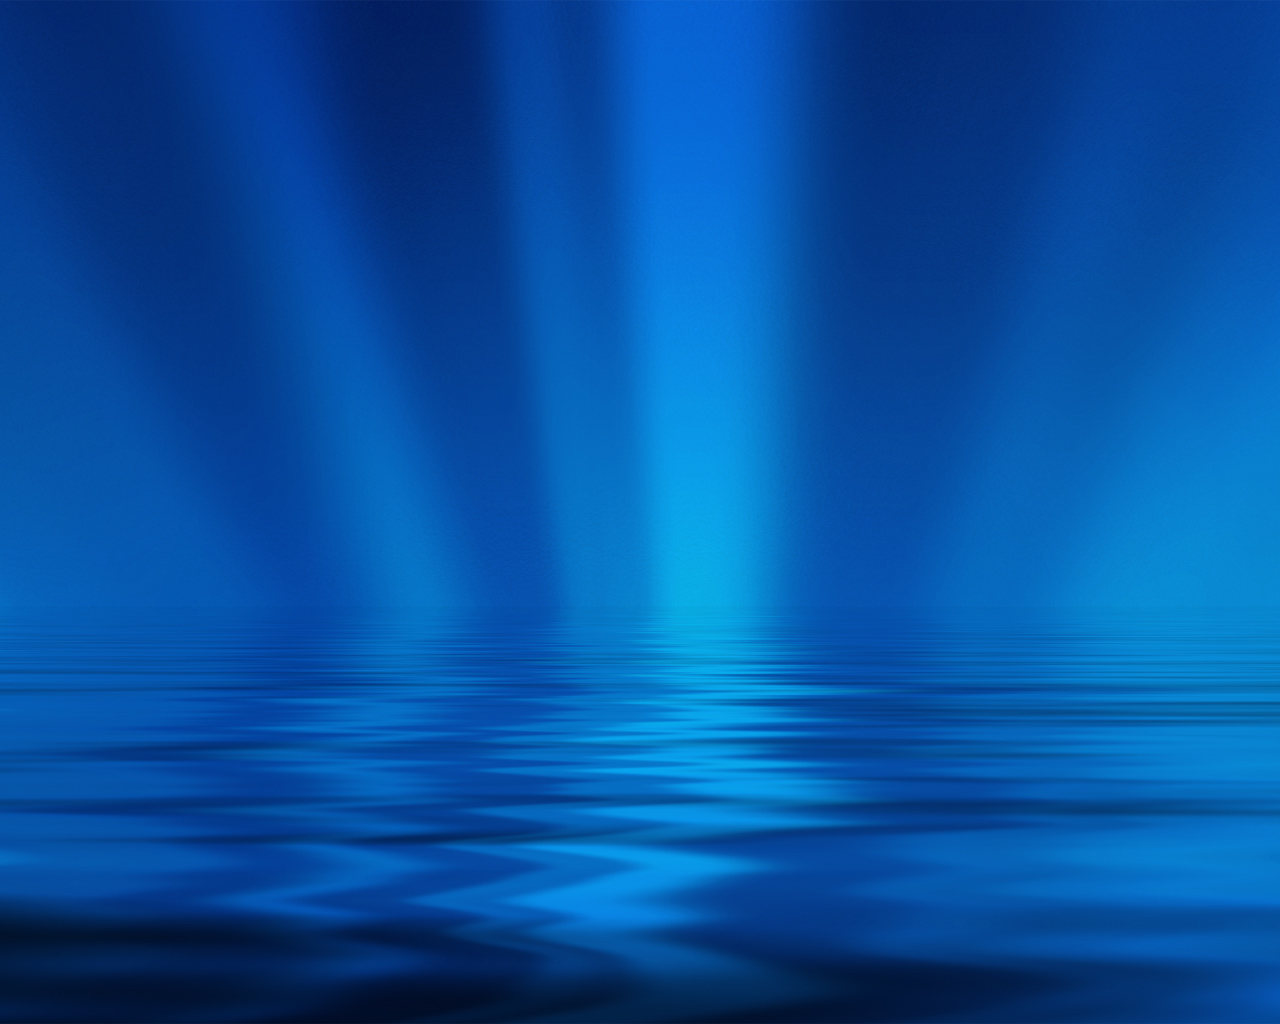 HD Blue Computer Wallpaper